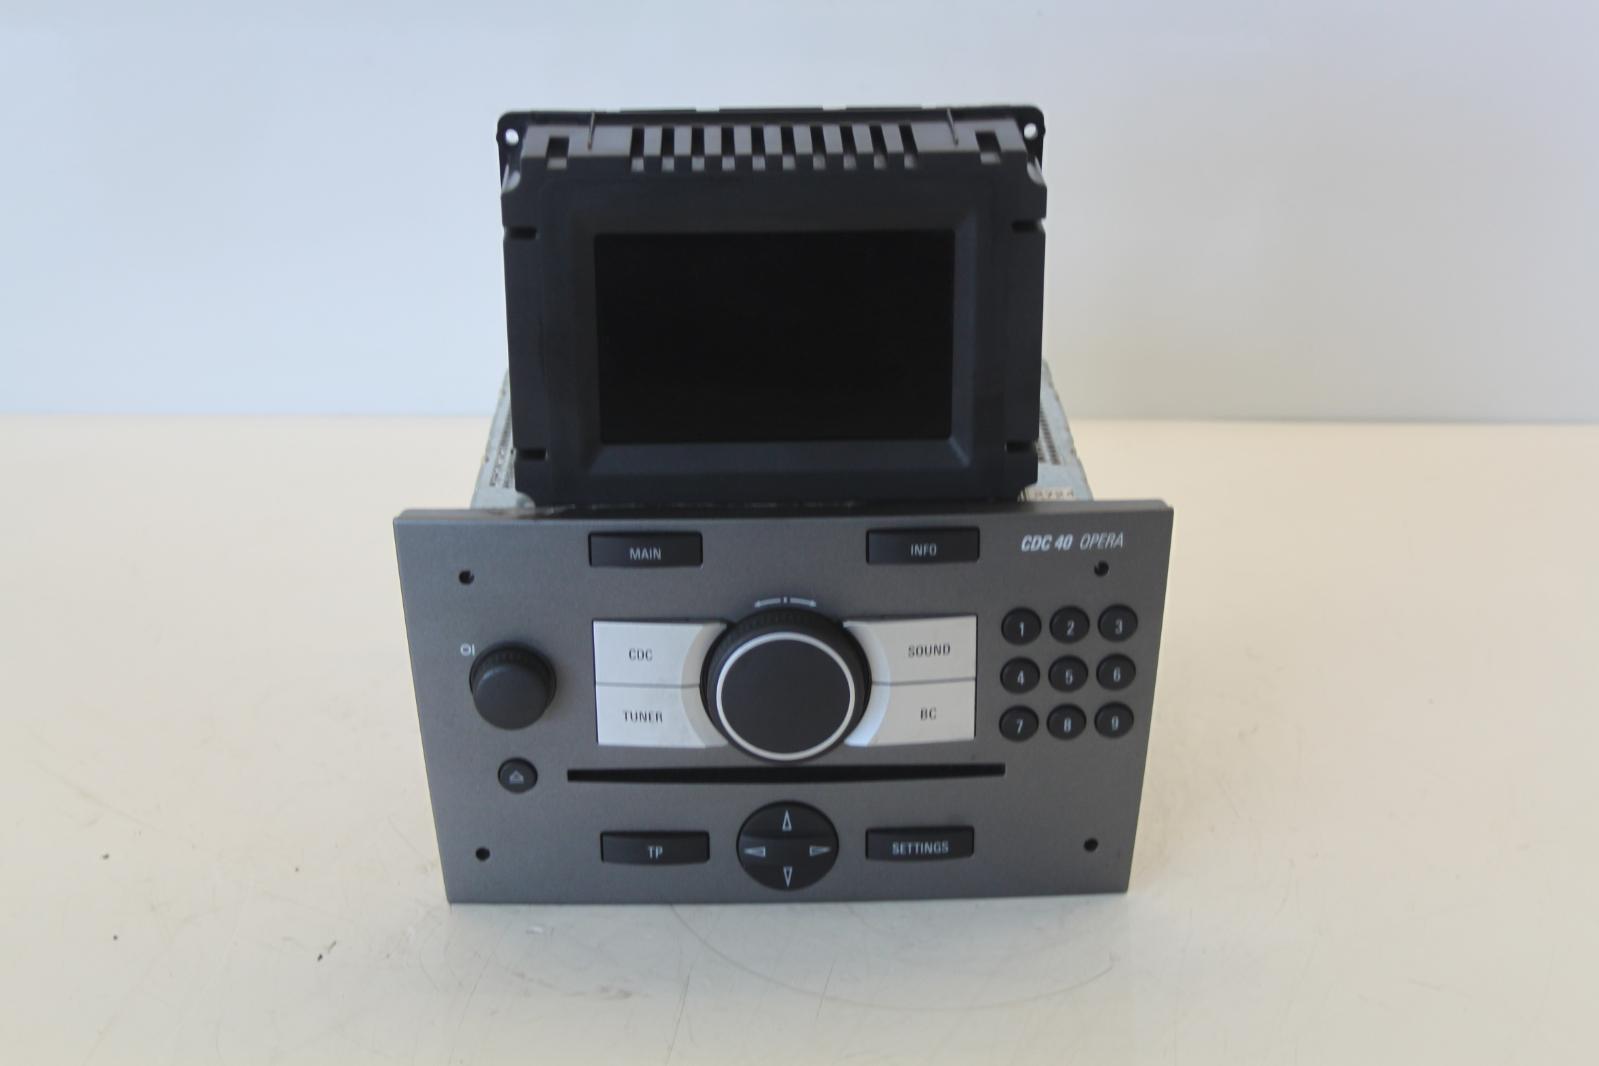 2008 vauxhall vectra c cdc40 stereo radio cd head unit. Black Bedroom Furniture Sets. Home Design Ideas